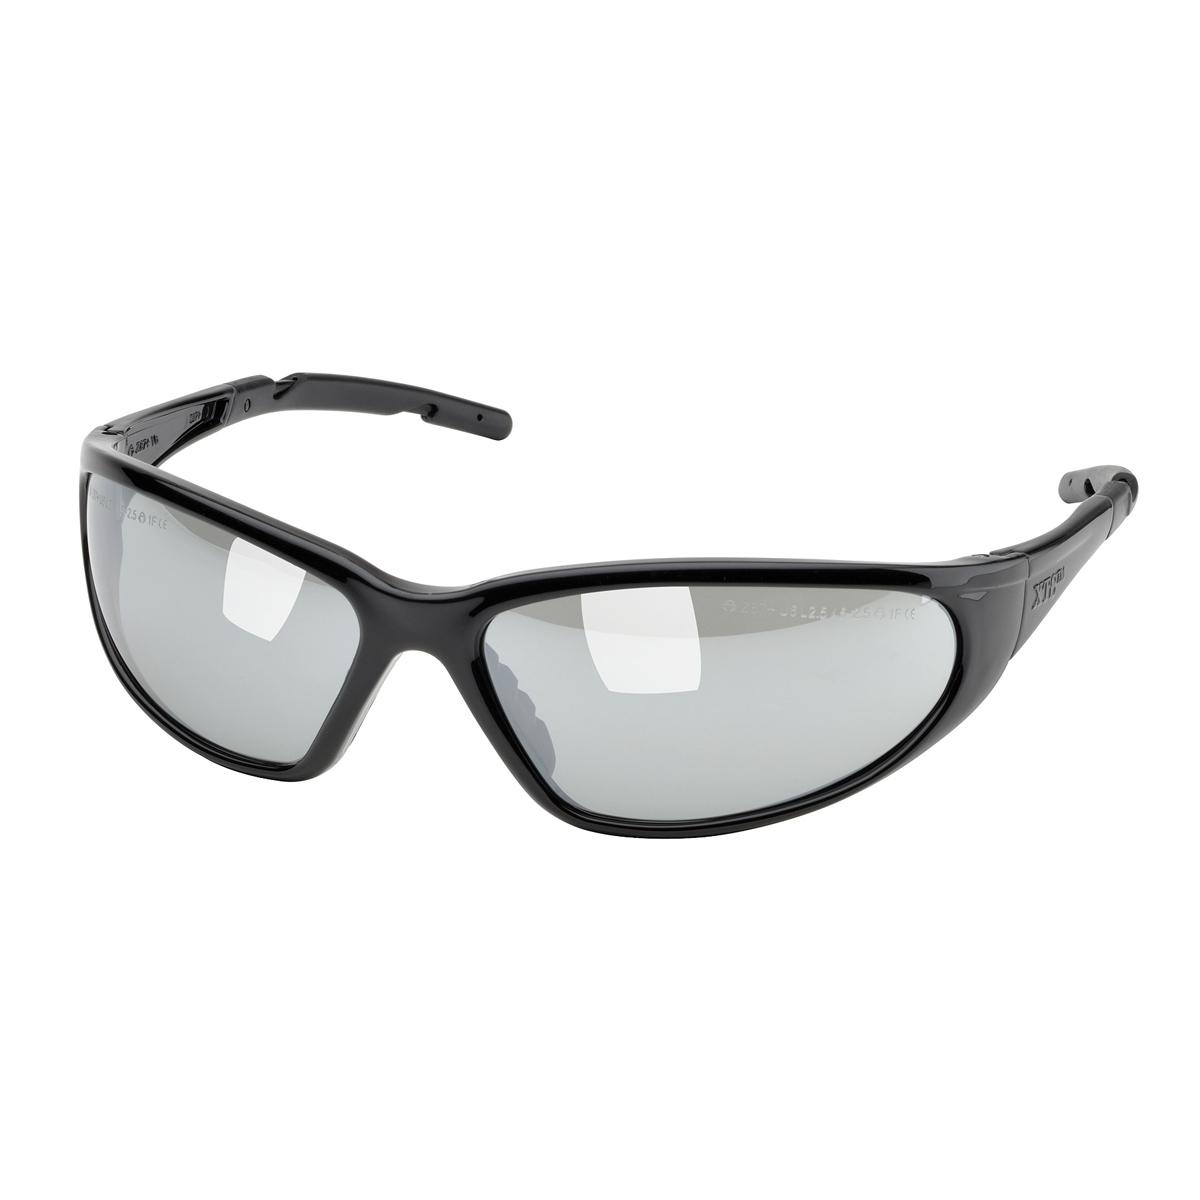 Black Frame Glasses Singapore : Elvex SG-24M-BLK XTS Safety Glasses - Glossy Black Frame ...